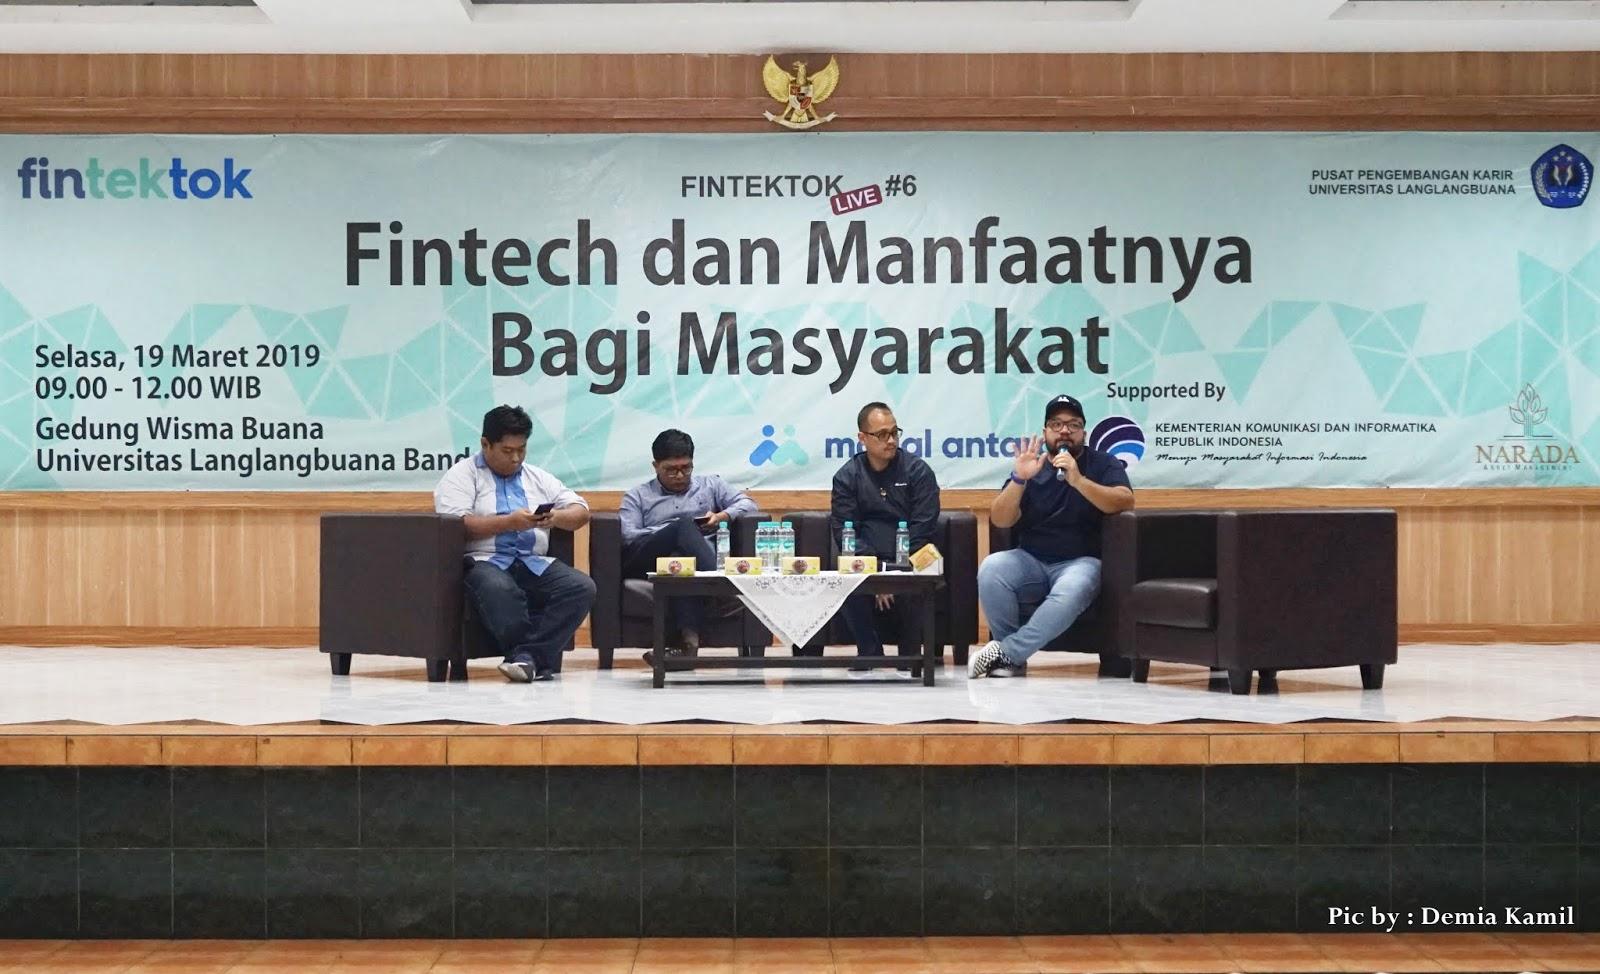 Mengenal Fintech dan Manfaatnya Bagi Masyarakat